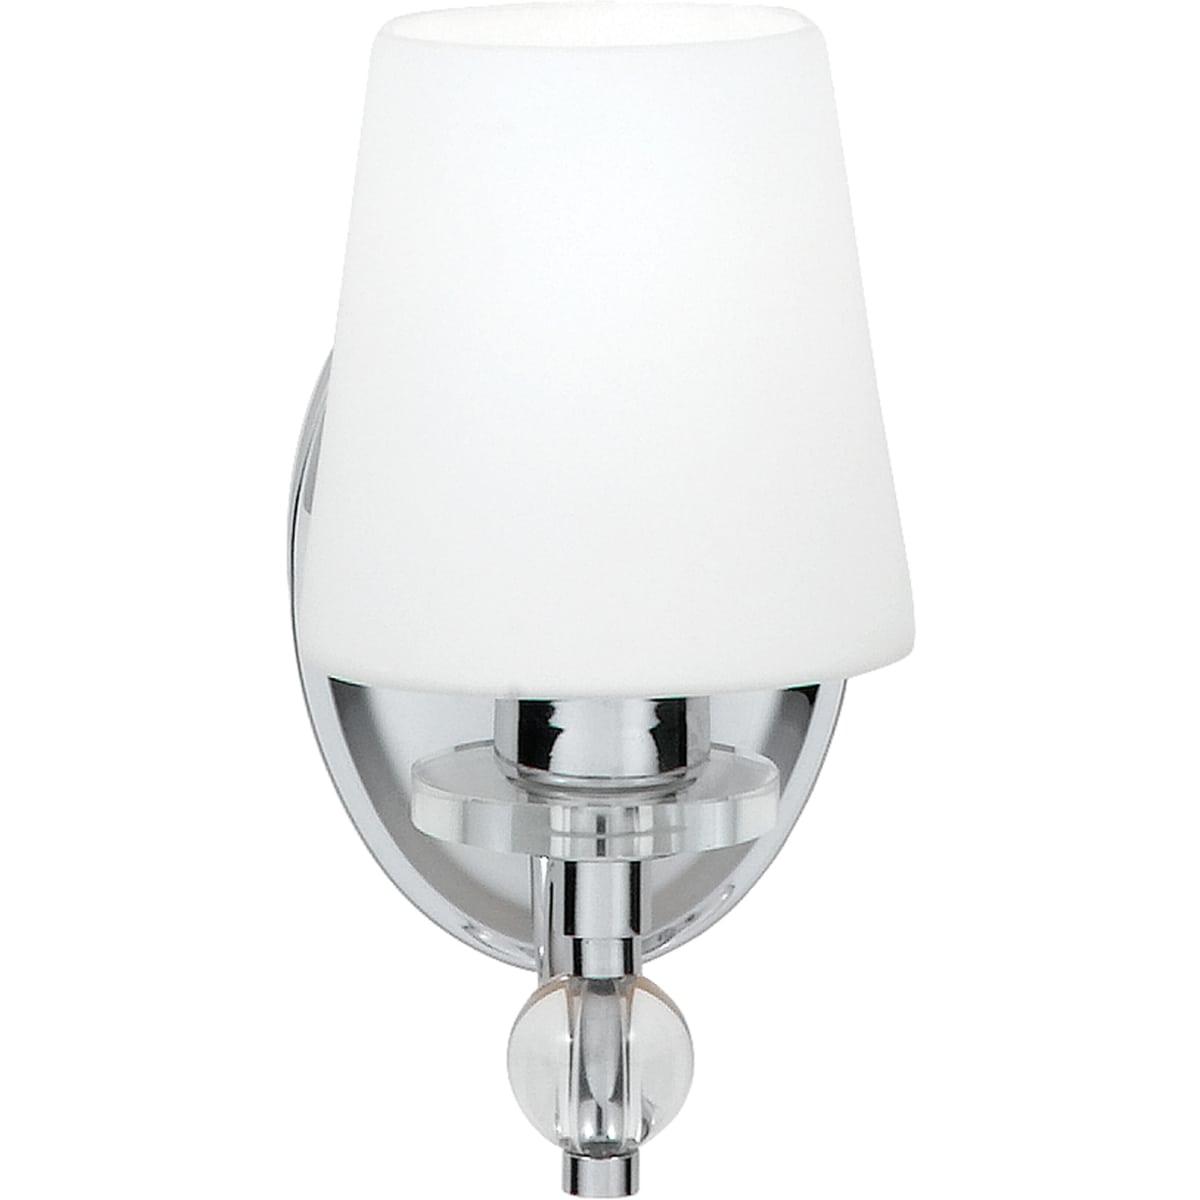 Quoizel Hs8601c Polished Chrome Hollister Single Light 10 Tall Bathroom Sconce Lightingdirect Com